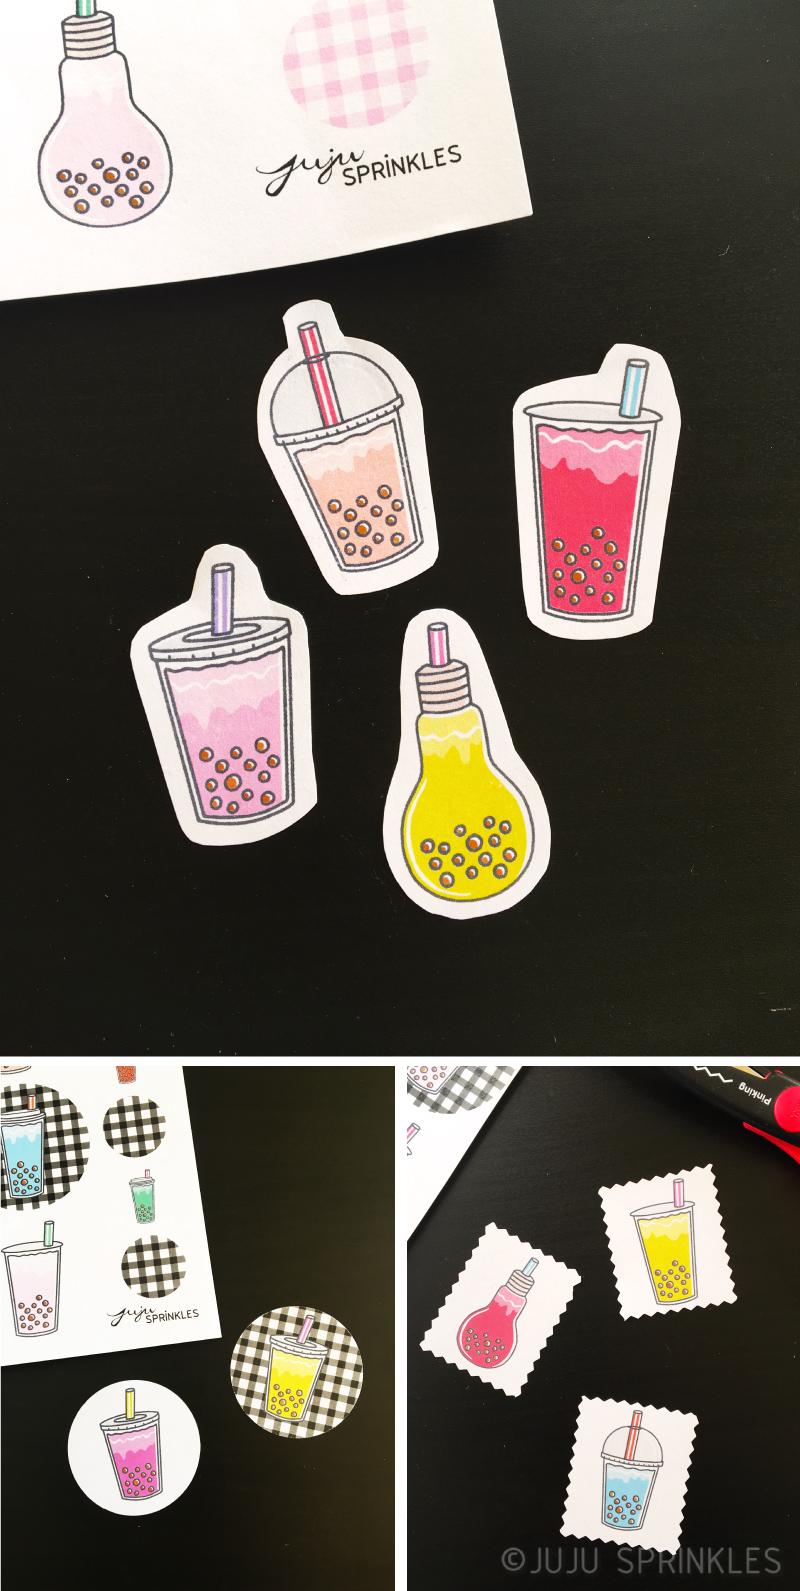 Free Bubble Tea Stickers Printable Juju Sprinkles